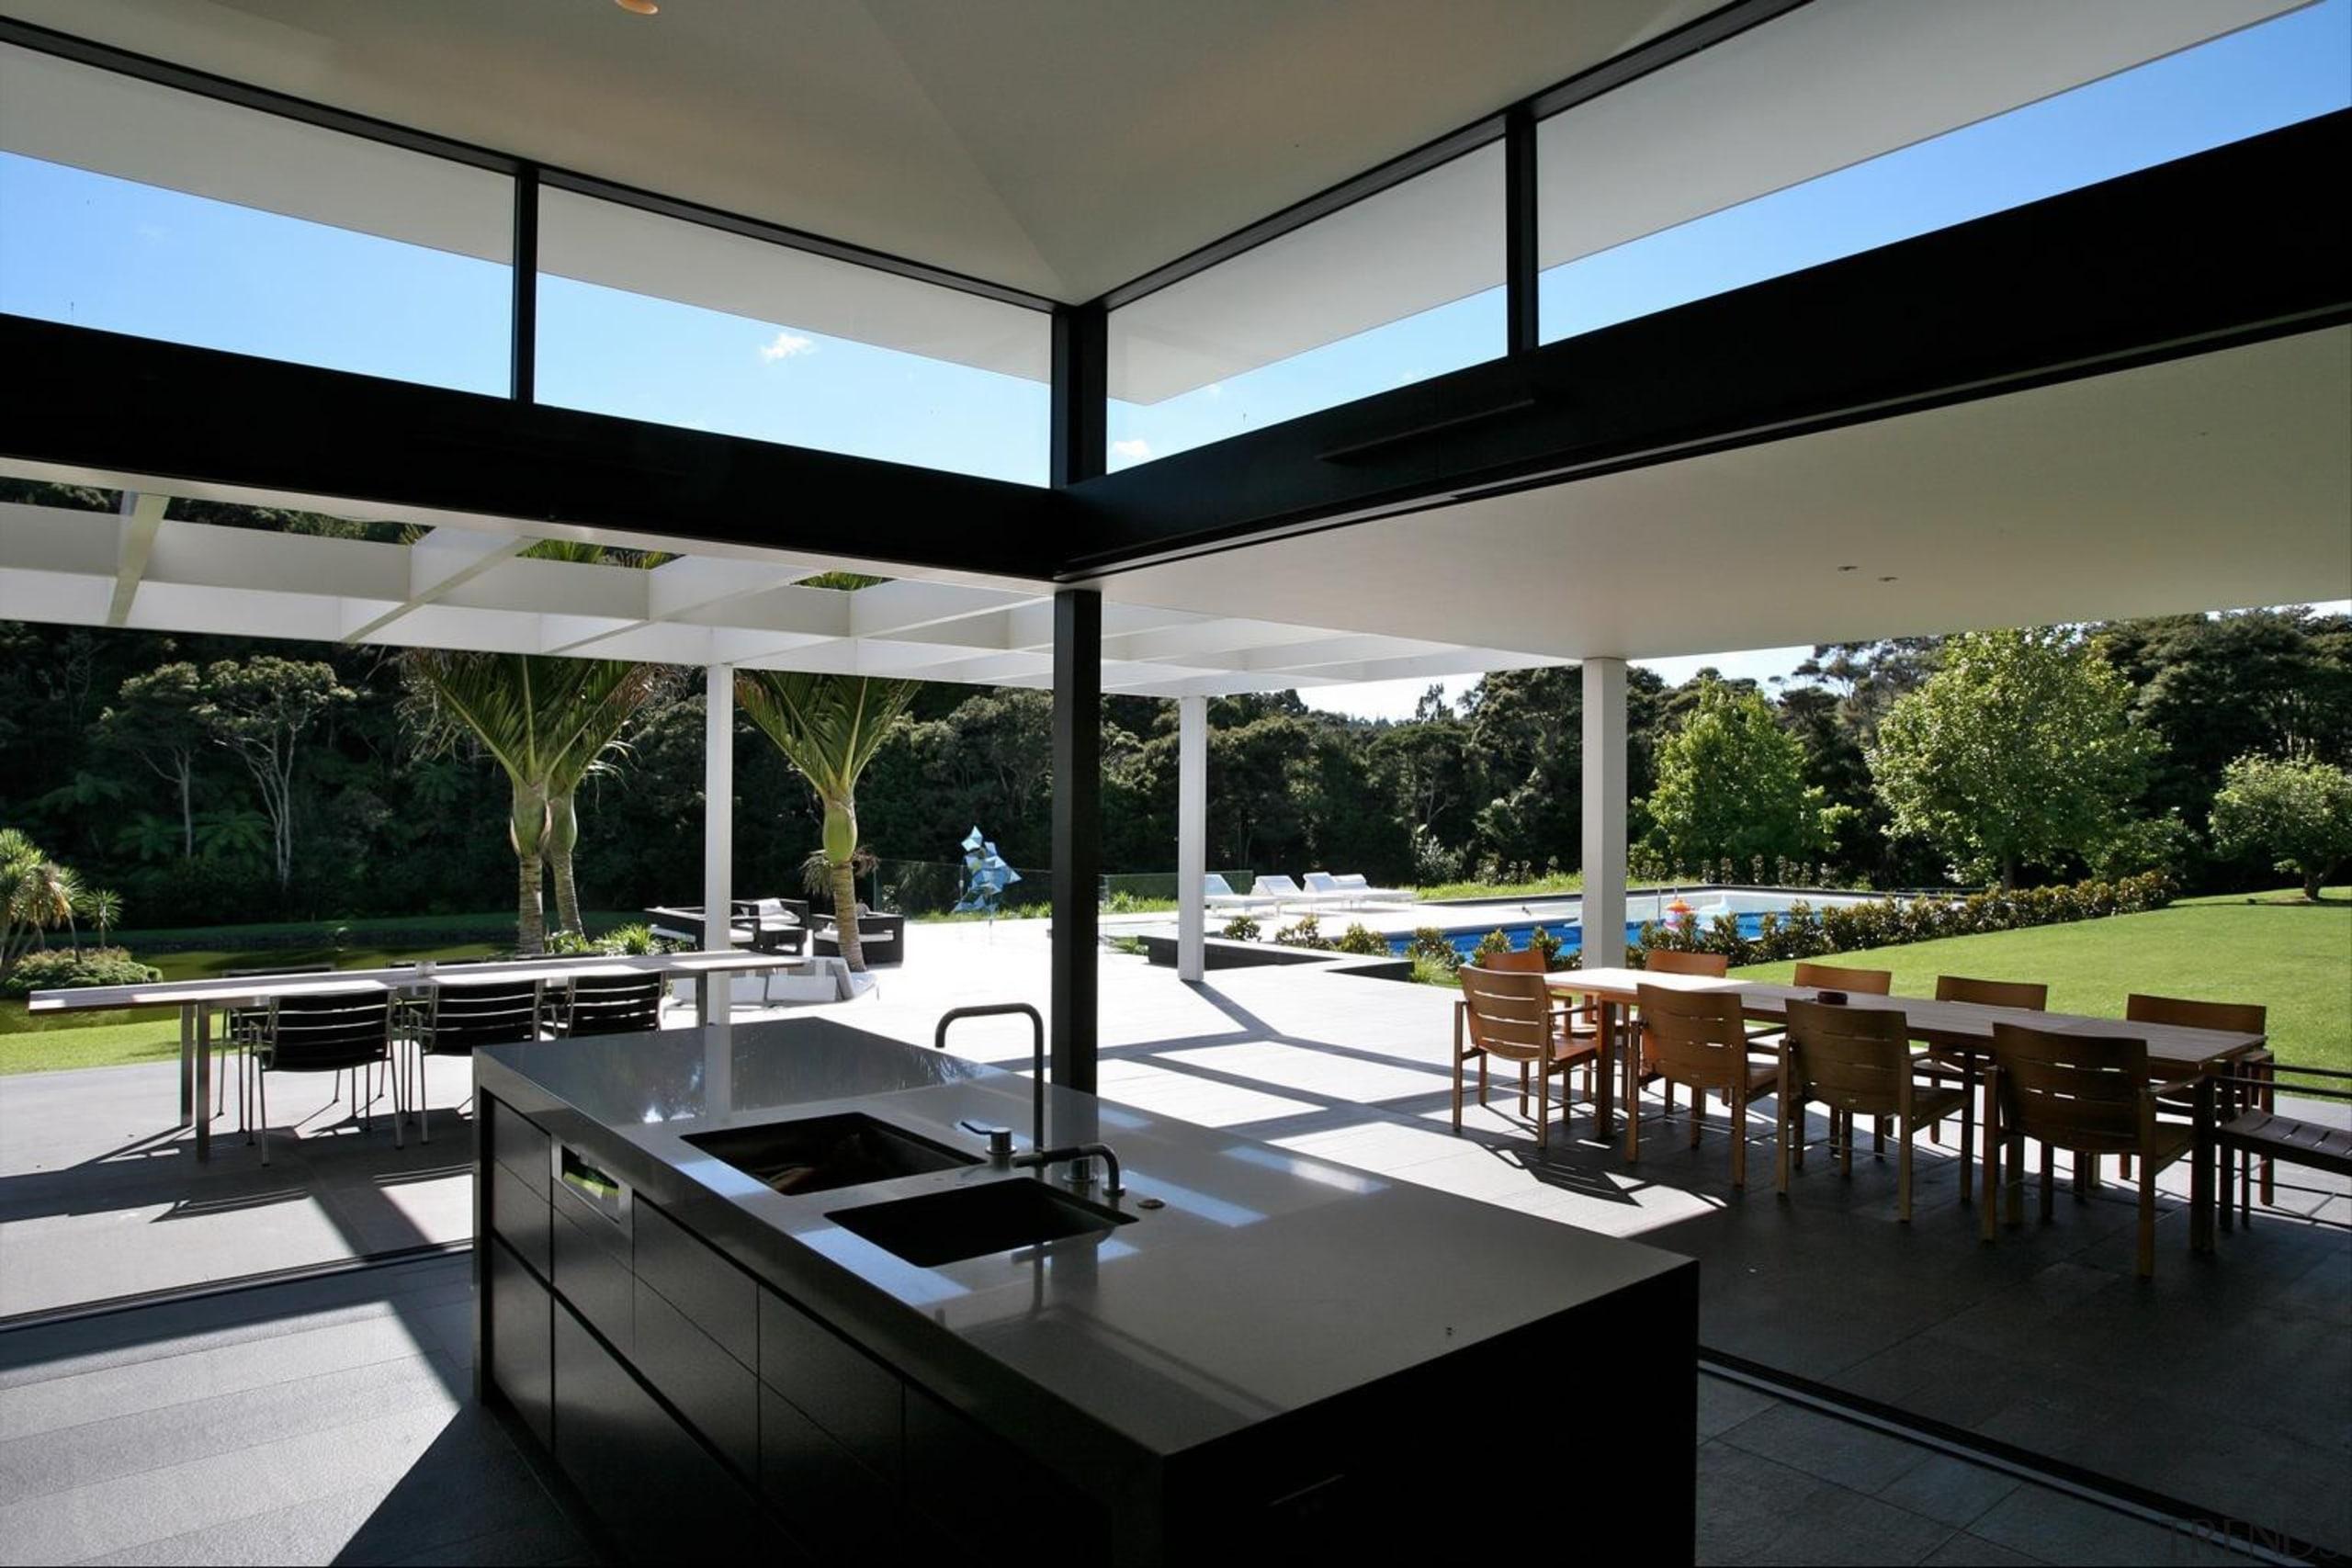 Coatesville House - Coatesville House - architecture   architecture, house, interior design, real estate, window, black, gray